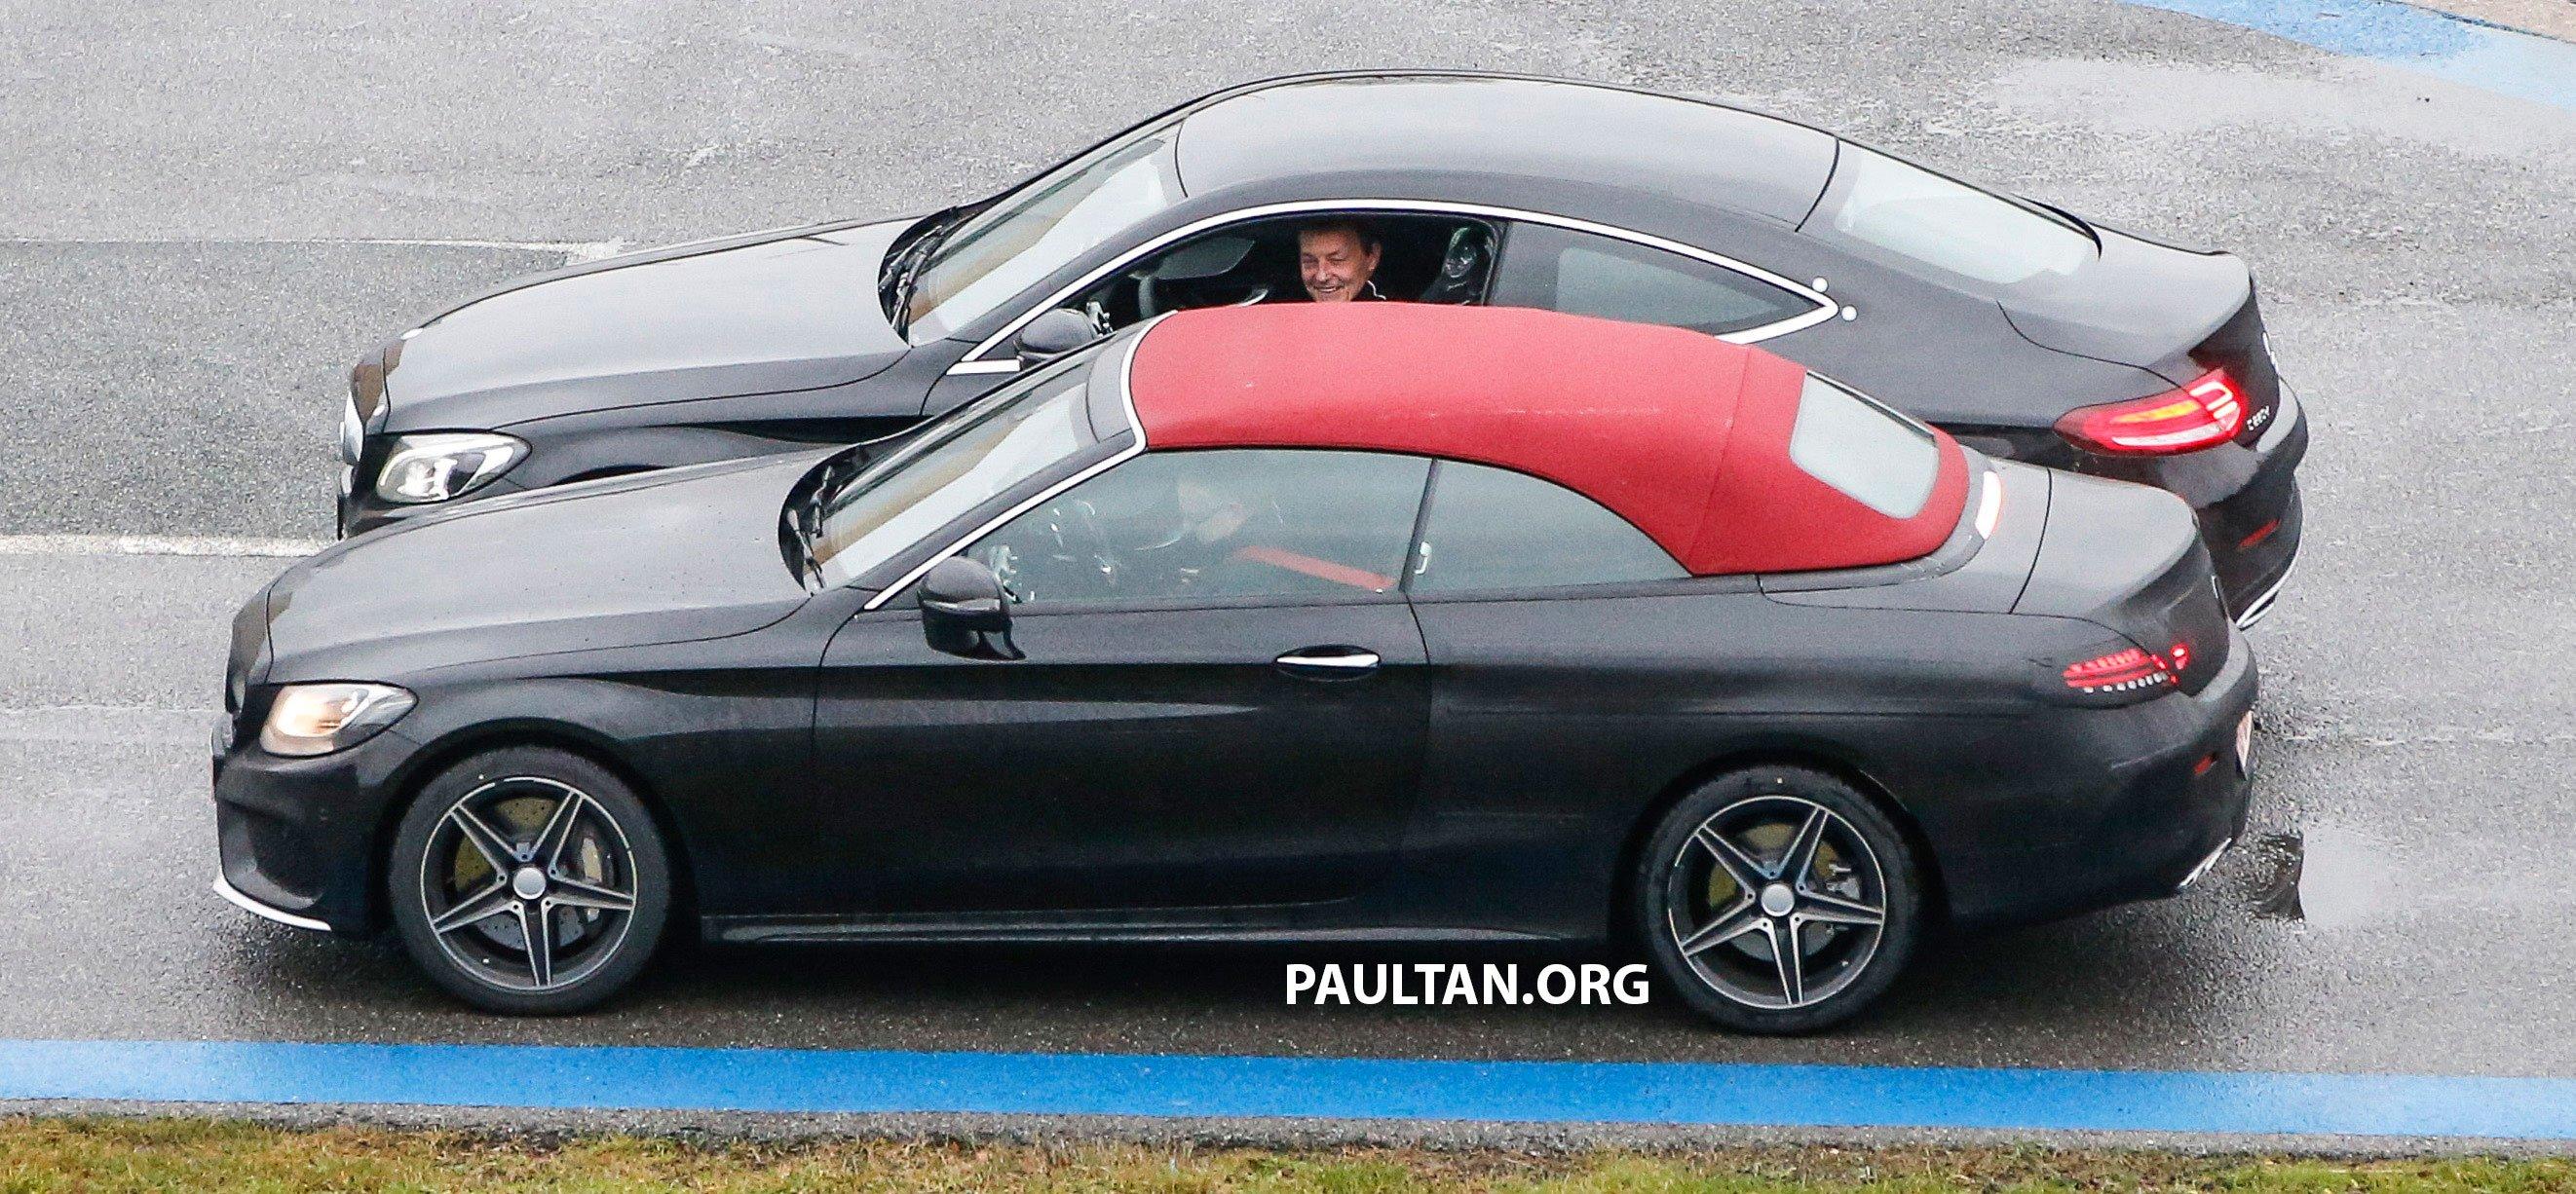 Spied Mercedes Benz C Class Cabriolet Undisguised Paul